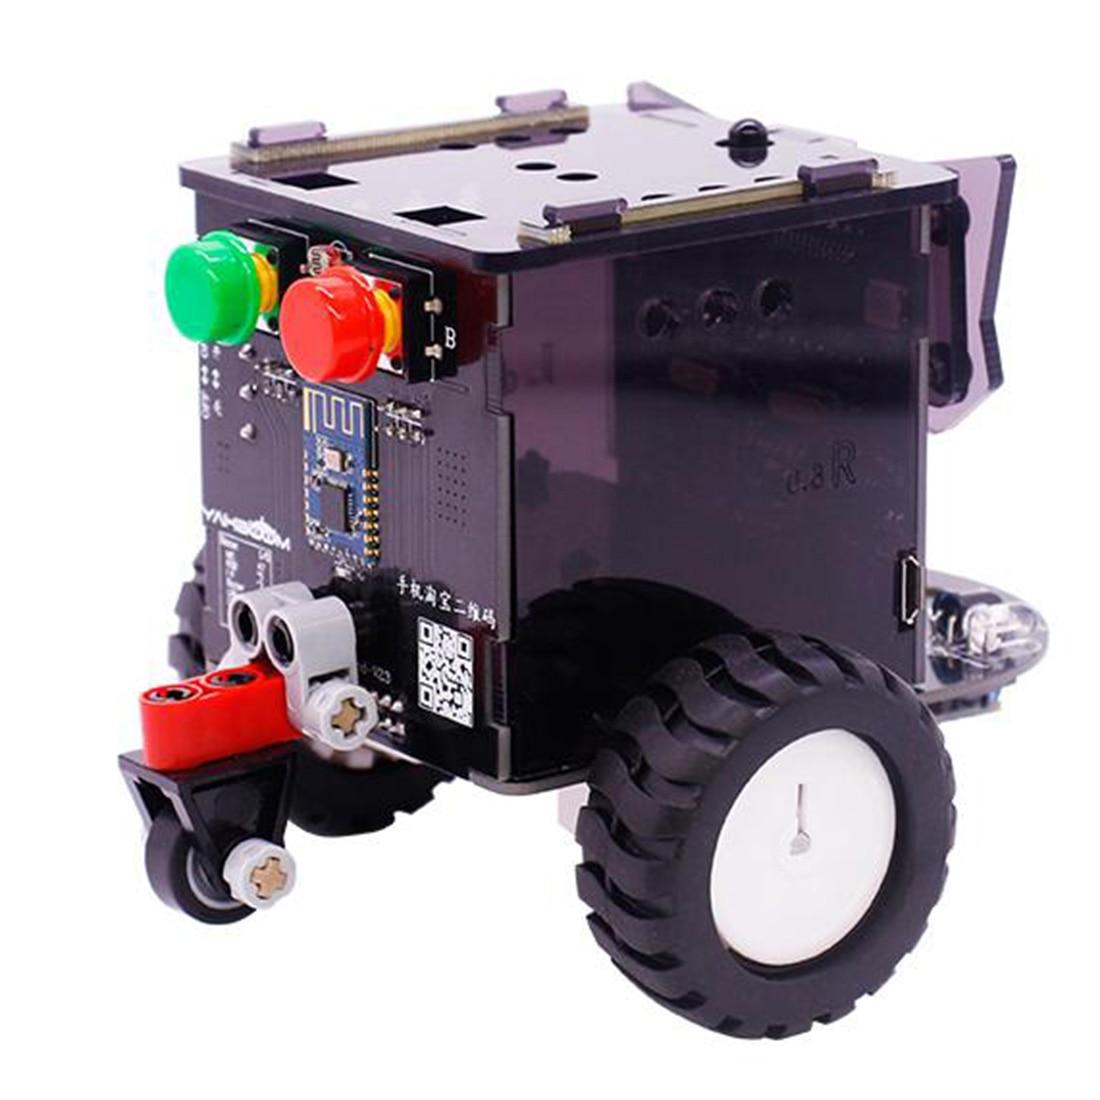 Standard Version Omibox Scratch Programmable Robot Car Kit Brain-Training Toy For Children Kids Educational Toys Birthday Gift